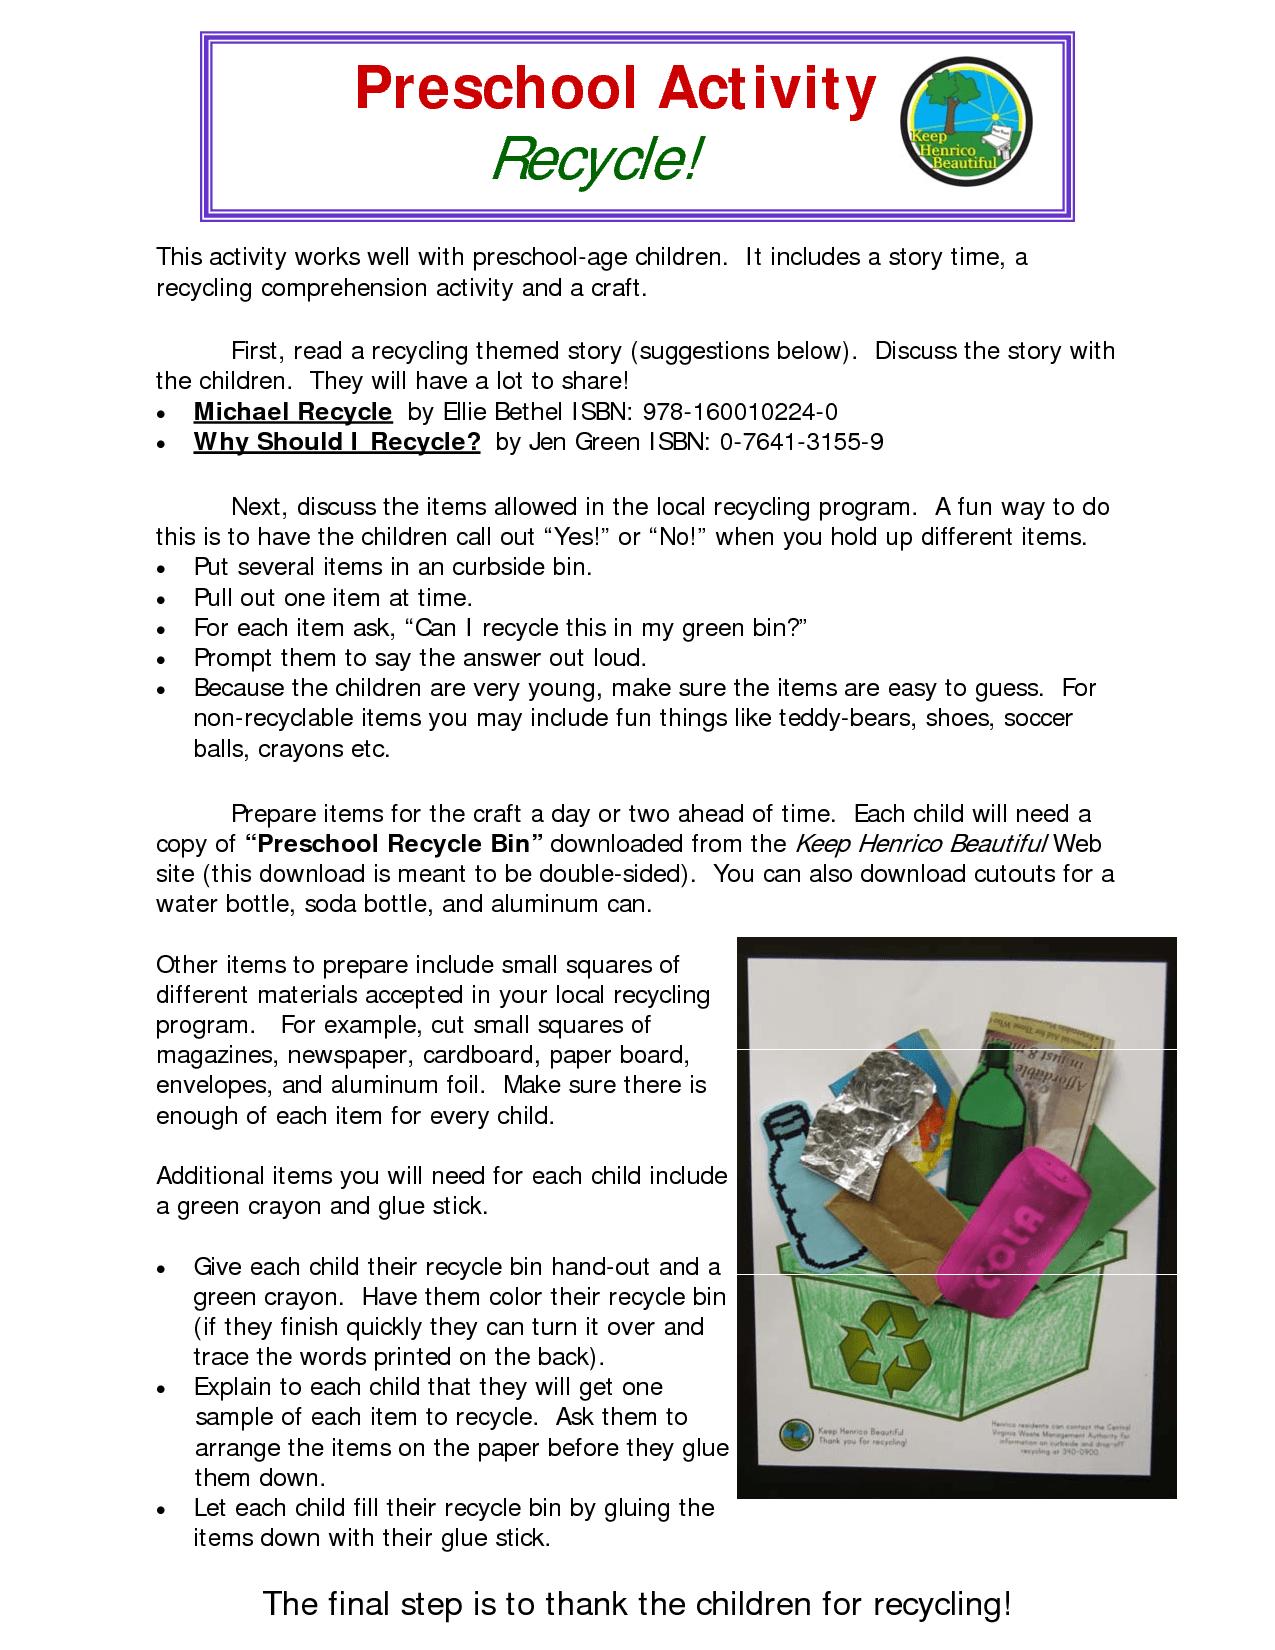 Recycling Preschool Activity Worksheet Link